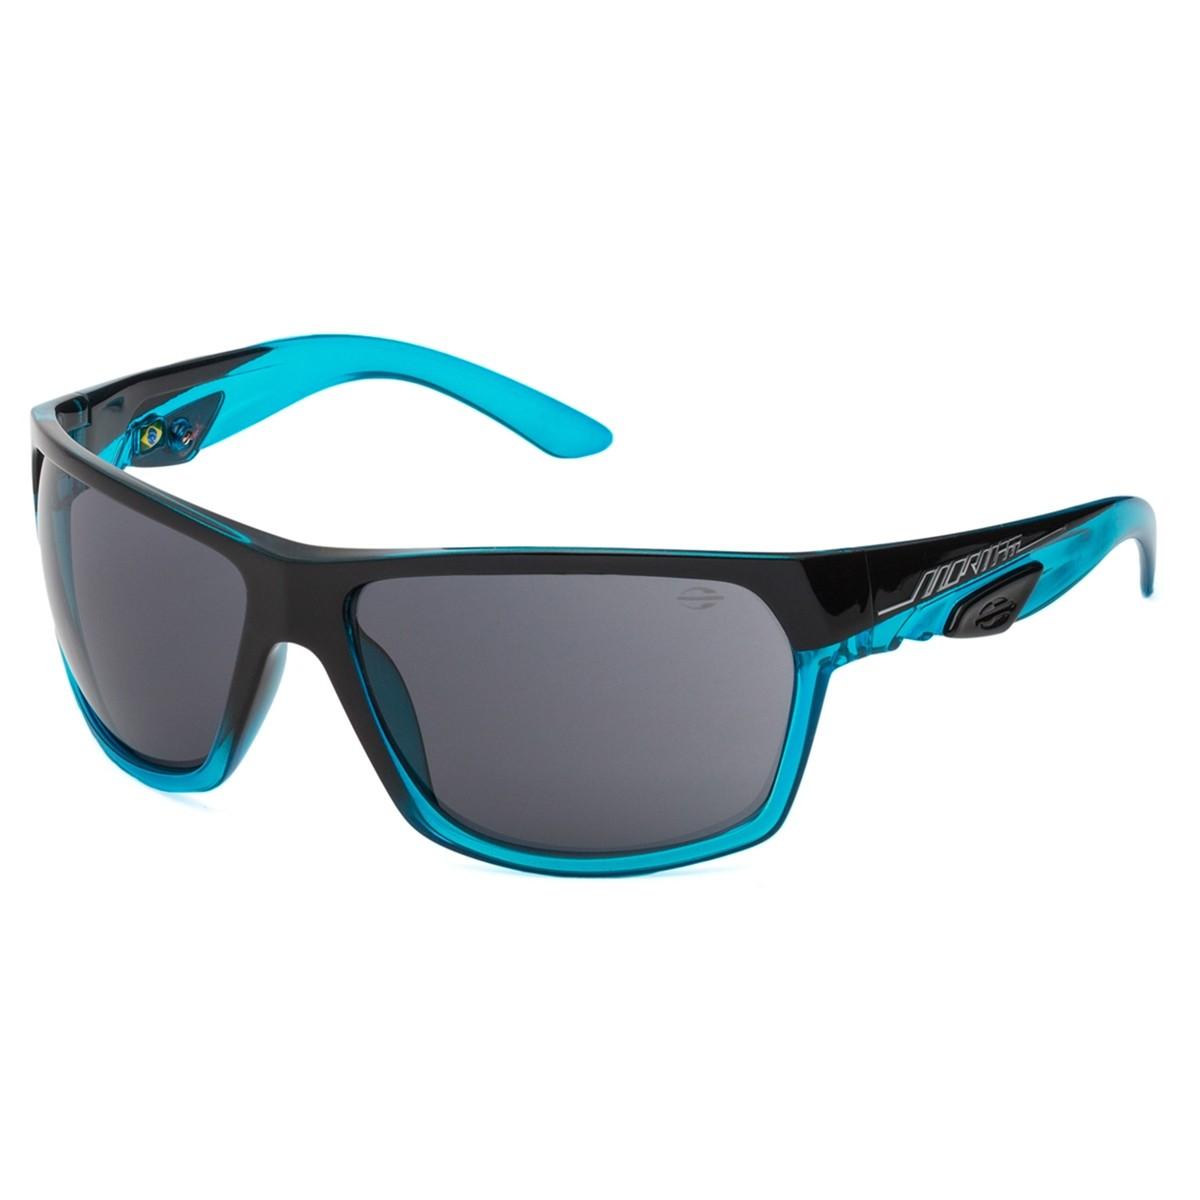 94515f6931727 Compre Óculos de Sol Mormaii Amazonia II em 10X